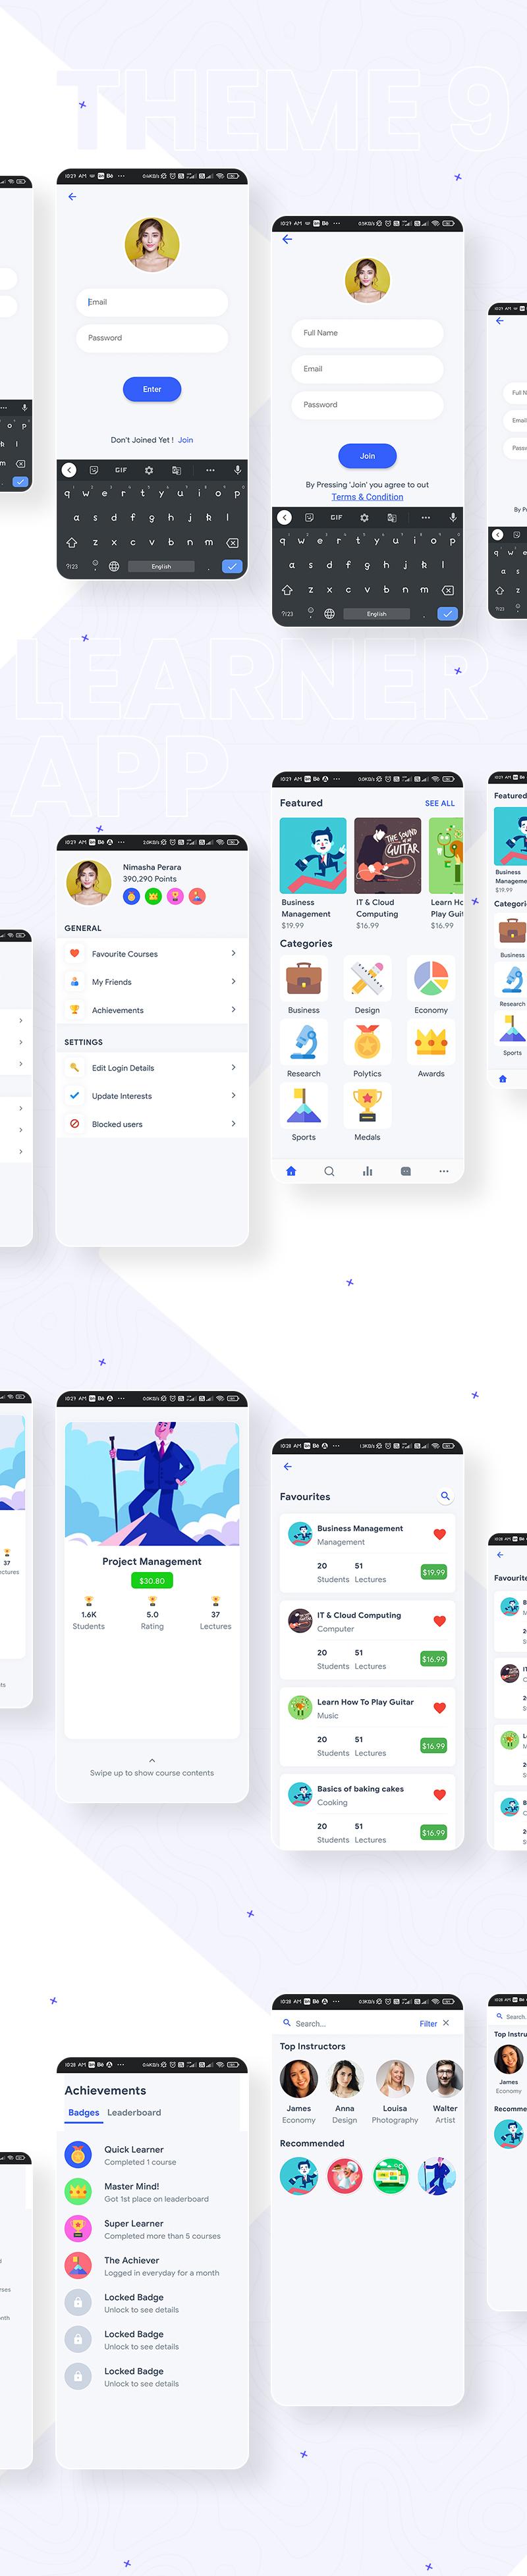 Flutter Mobile App Templates | Prokit | Iqonic Design  biggest flutter 2.0 ui kit ProKit theme 9